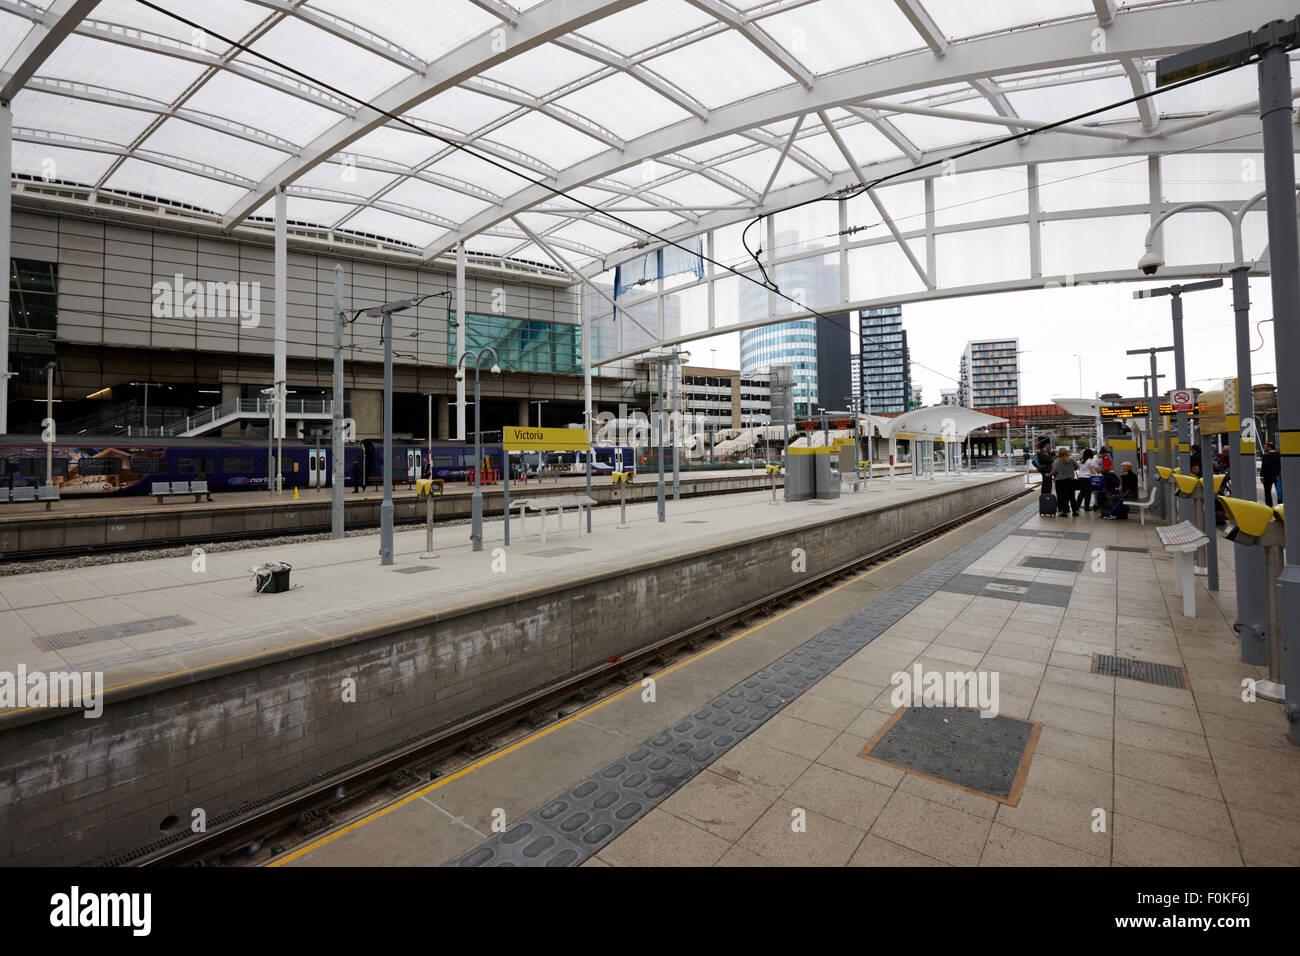 Manchester Victoria Railway Station Metrolink Platforms England UK Stock Photo Royalty Free ...